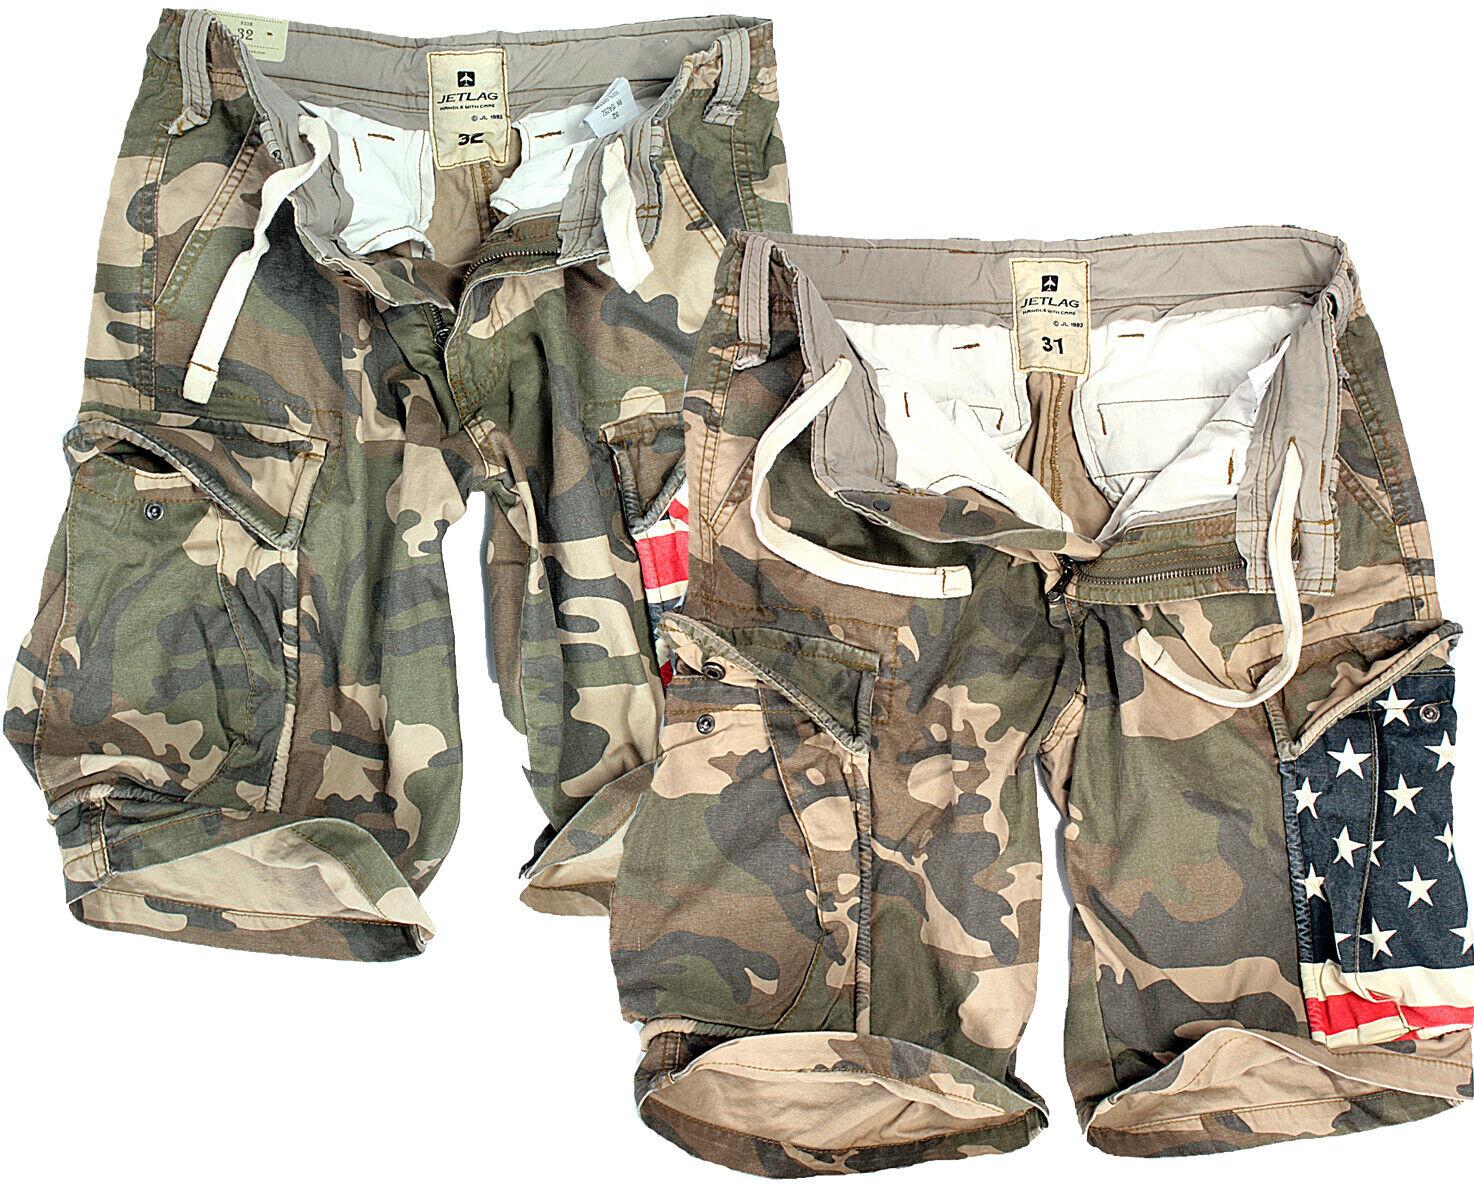 36bbcc0b14 Jet Lag Men's Cargo Bermuda Shorts Short Trousers Army Camouflage USA  Australia 36 Army-usa for sale online | eBay